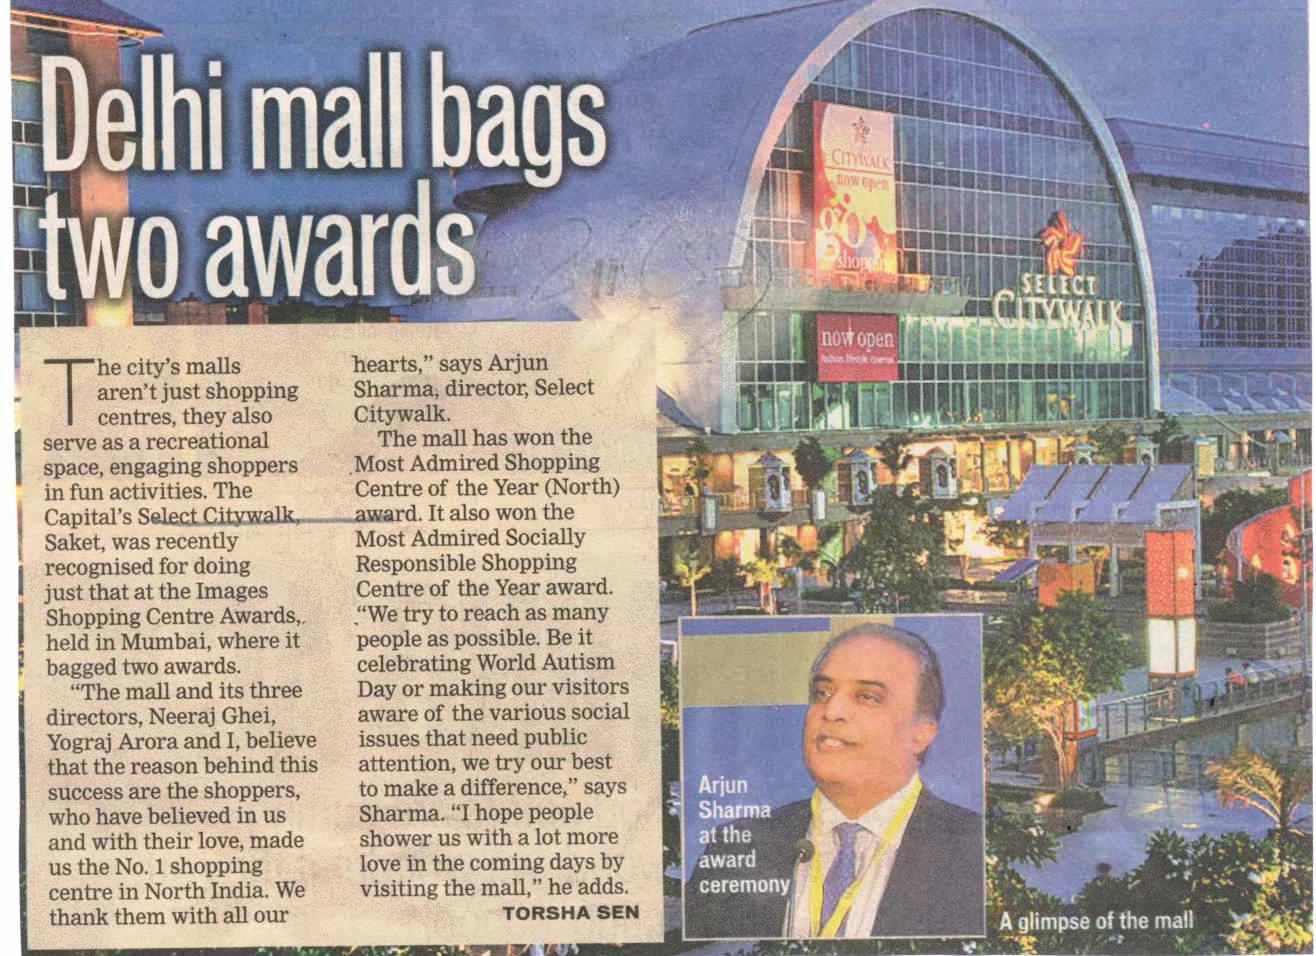 Delhi mall bags two awards